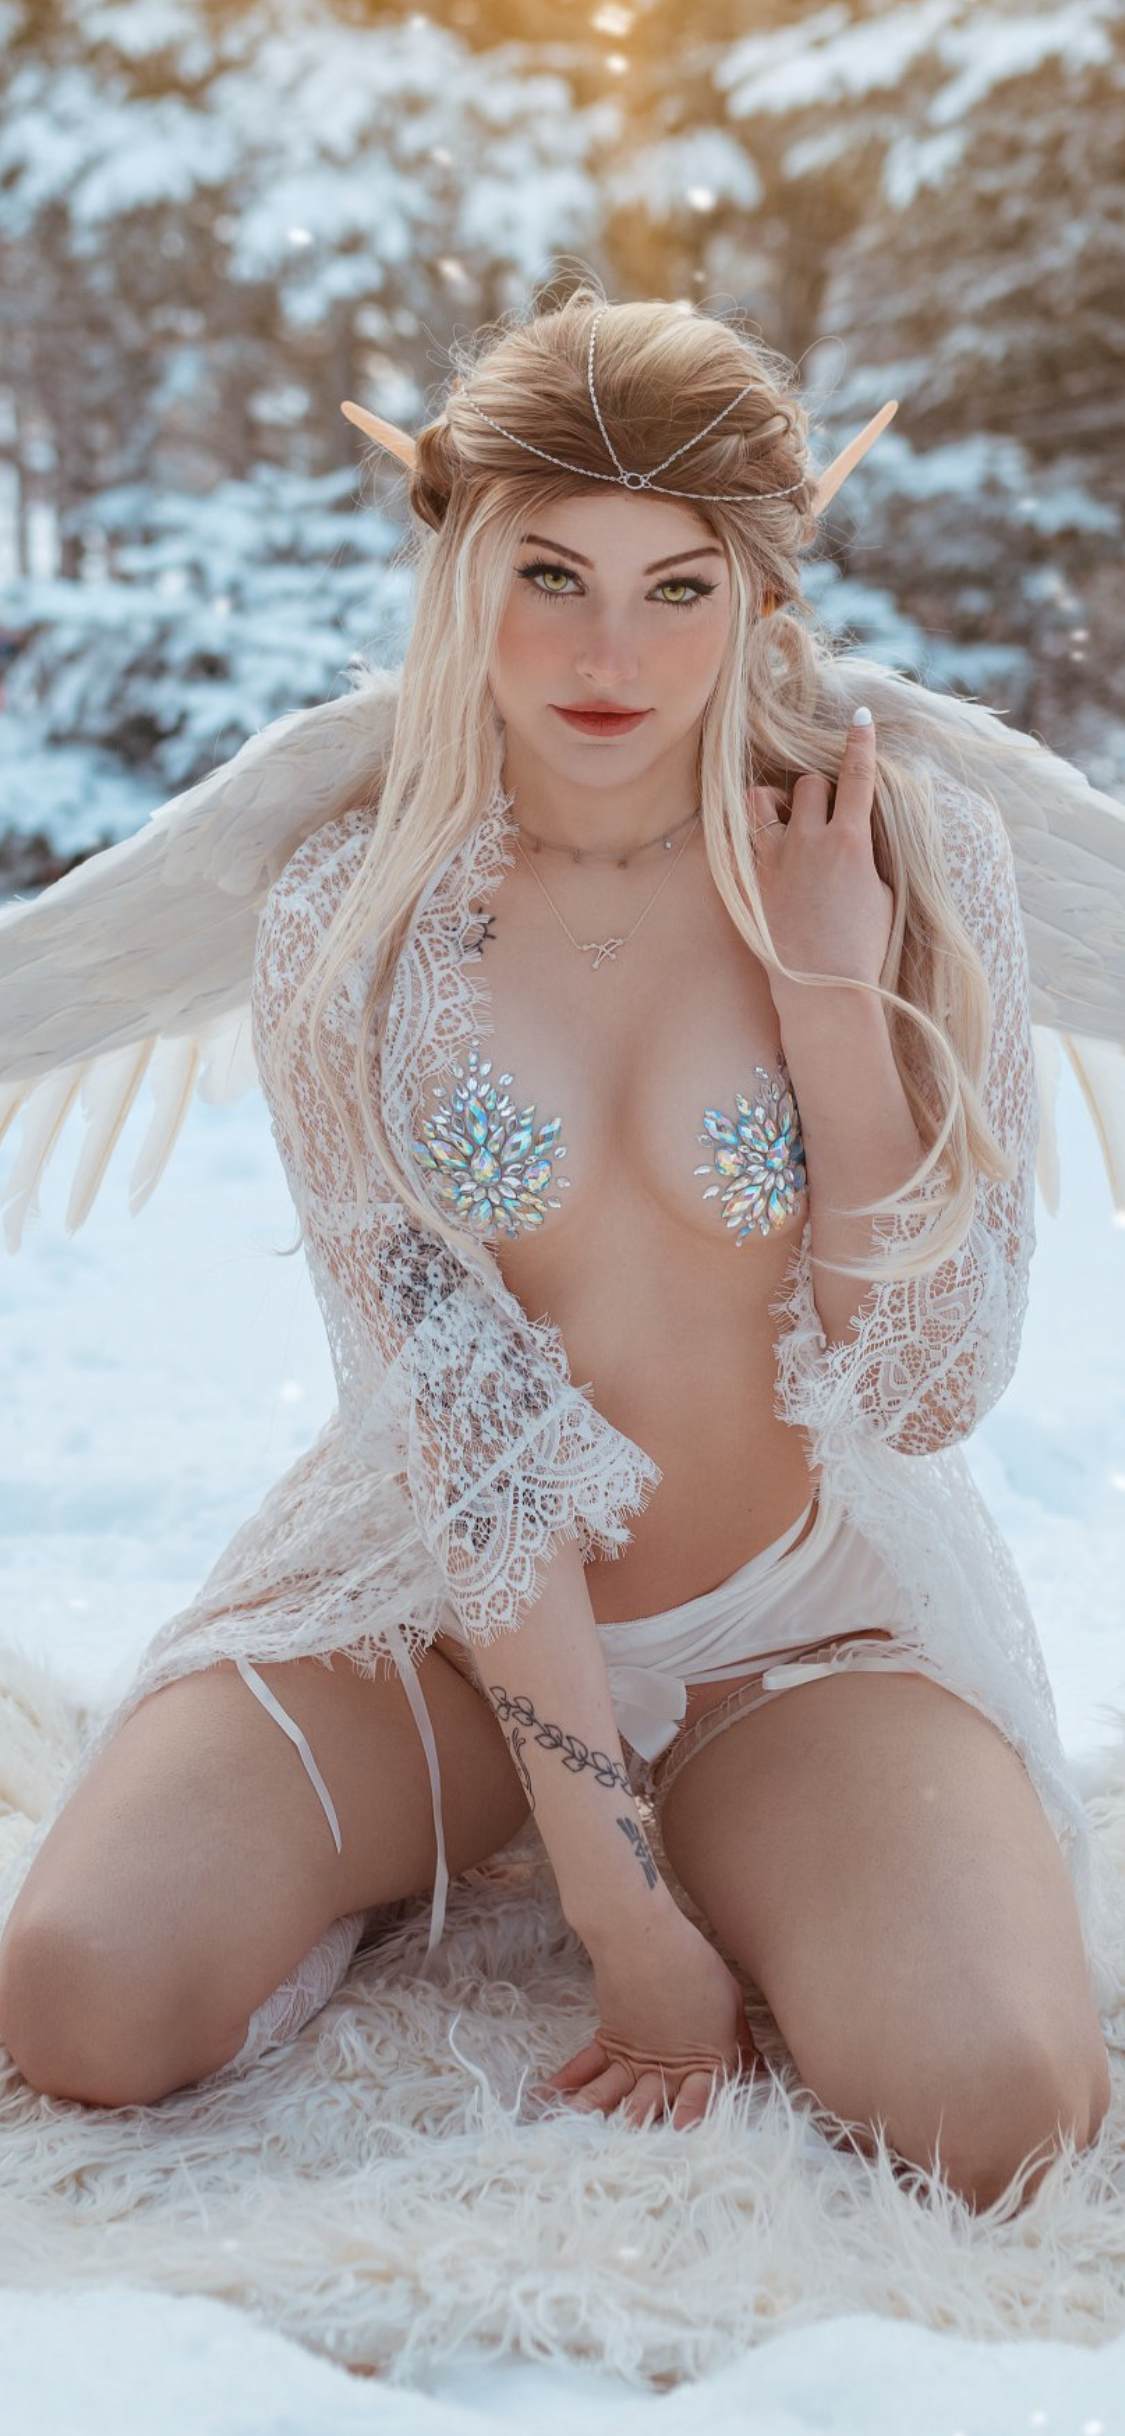 bikinis in snow Iwitness angels